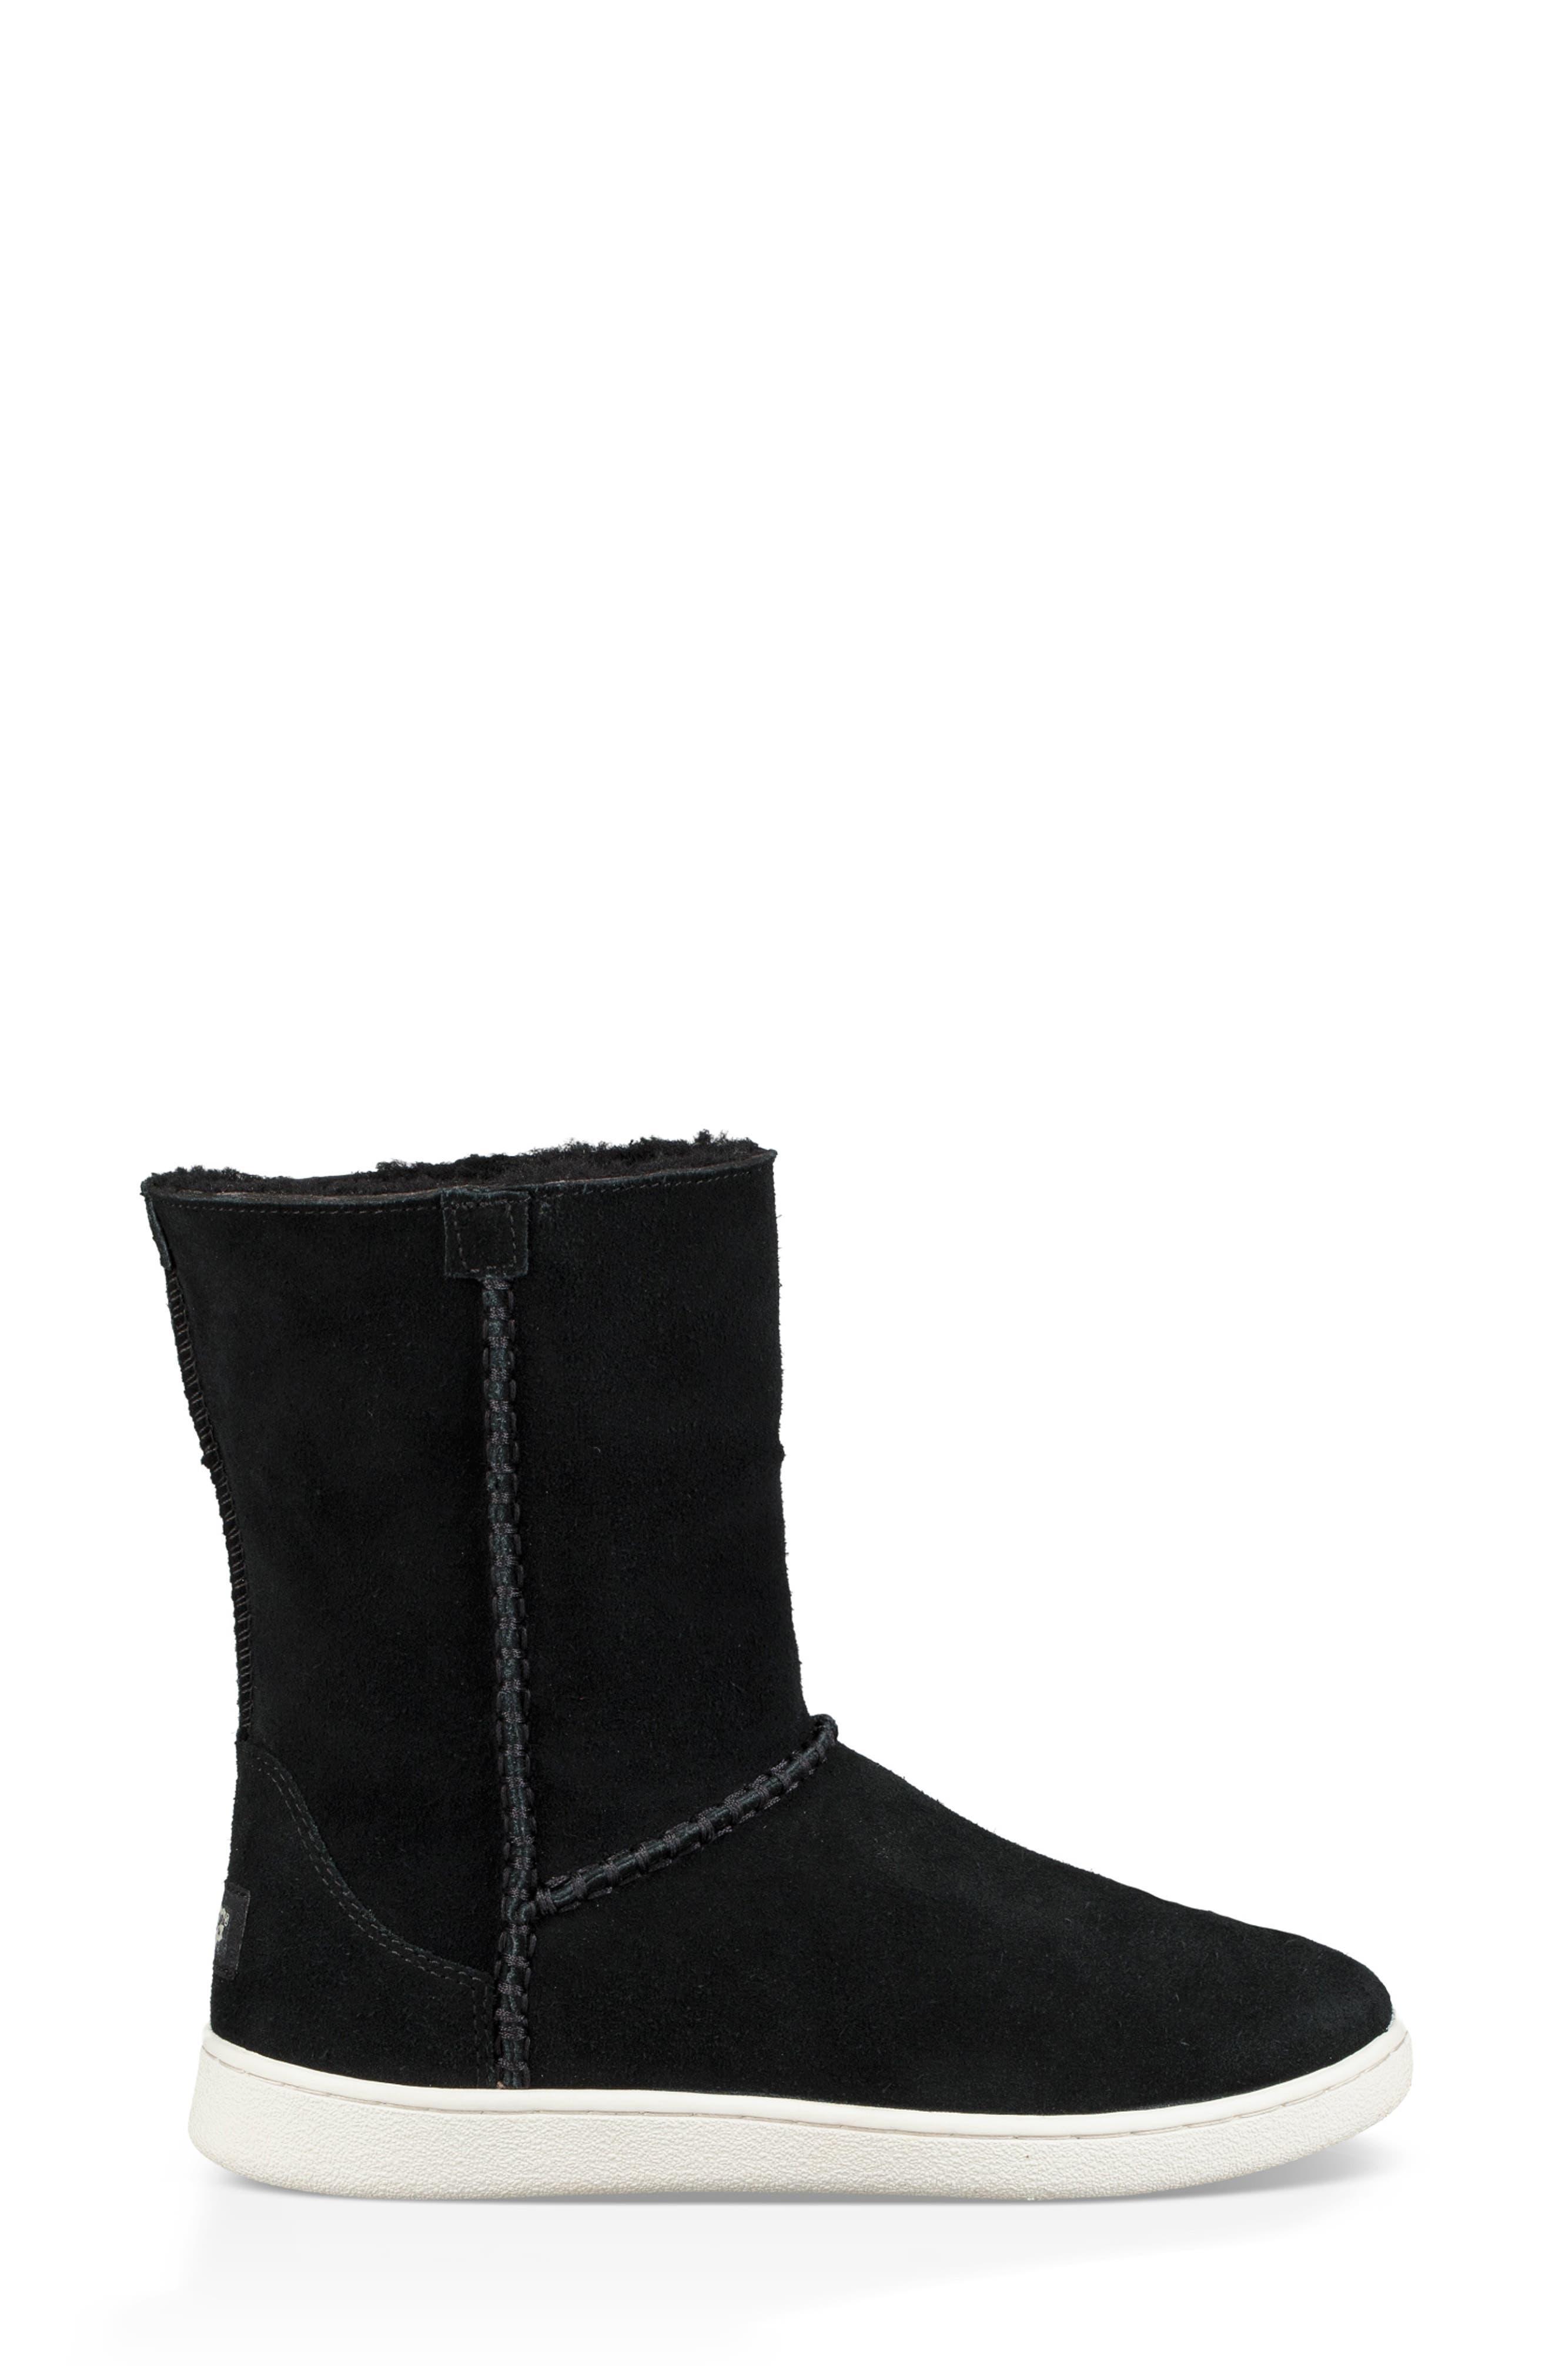 Mika Classic Genuine Shearling Sneaker,                             Alternate thumbnail 7, color,                             BLACK